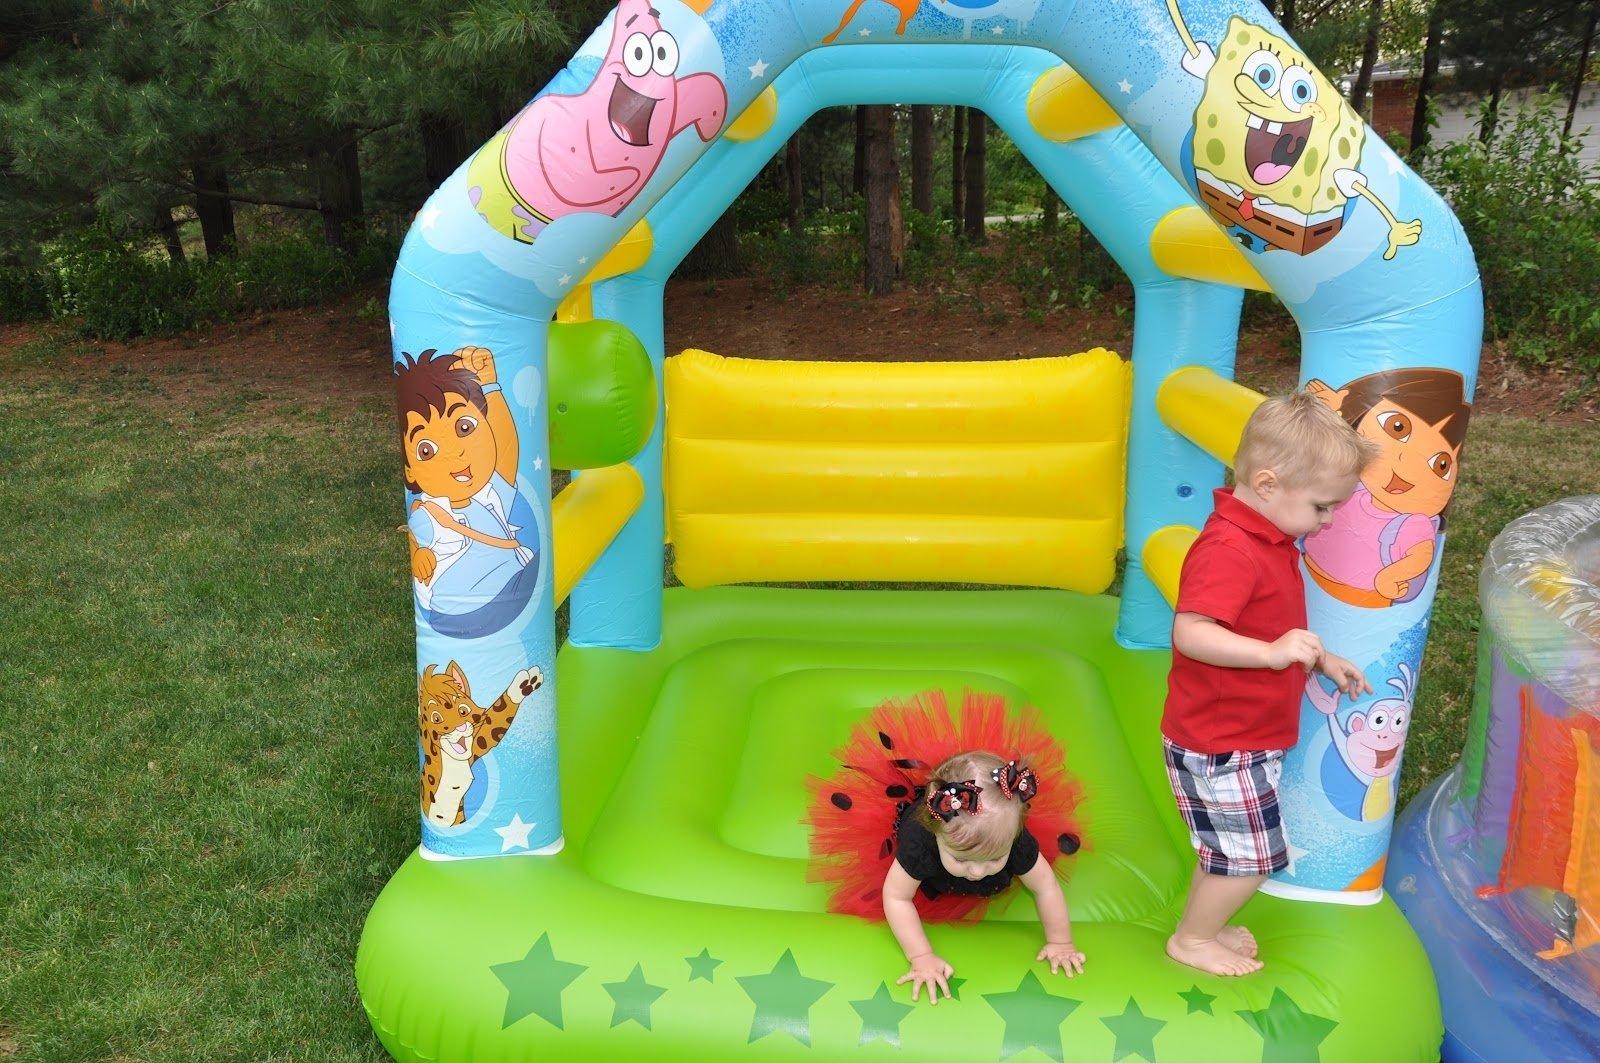 10 Amazing 1 Year Old Boy Birthday Gift Ideas sutherlands 2008 2012 whitneys ladybug birthday party 2021